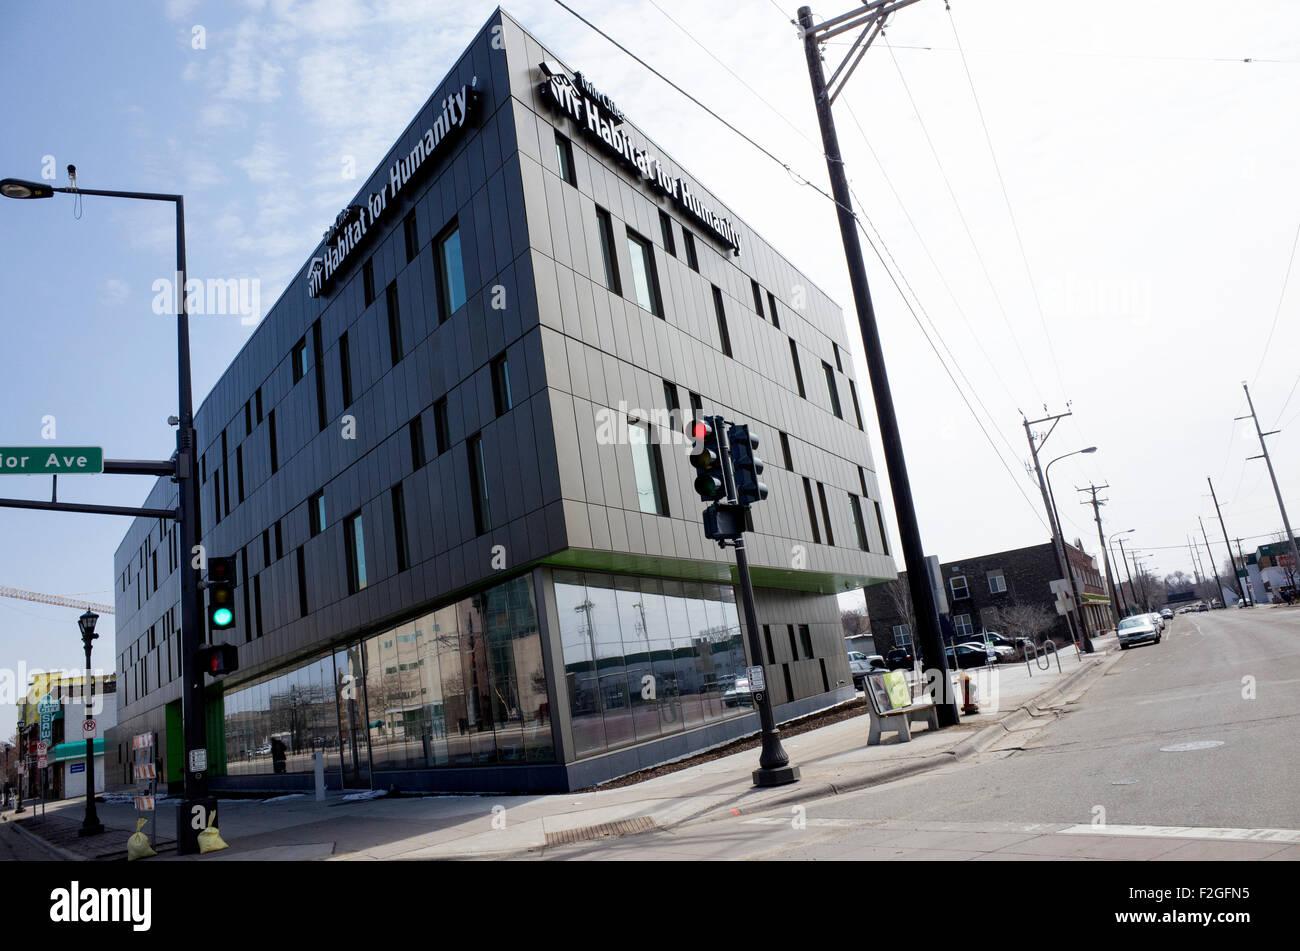 New Habitat for Humanity building on University Ave. near Snelling Ave. St Paul Minnesota MN USA - Stock Image